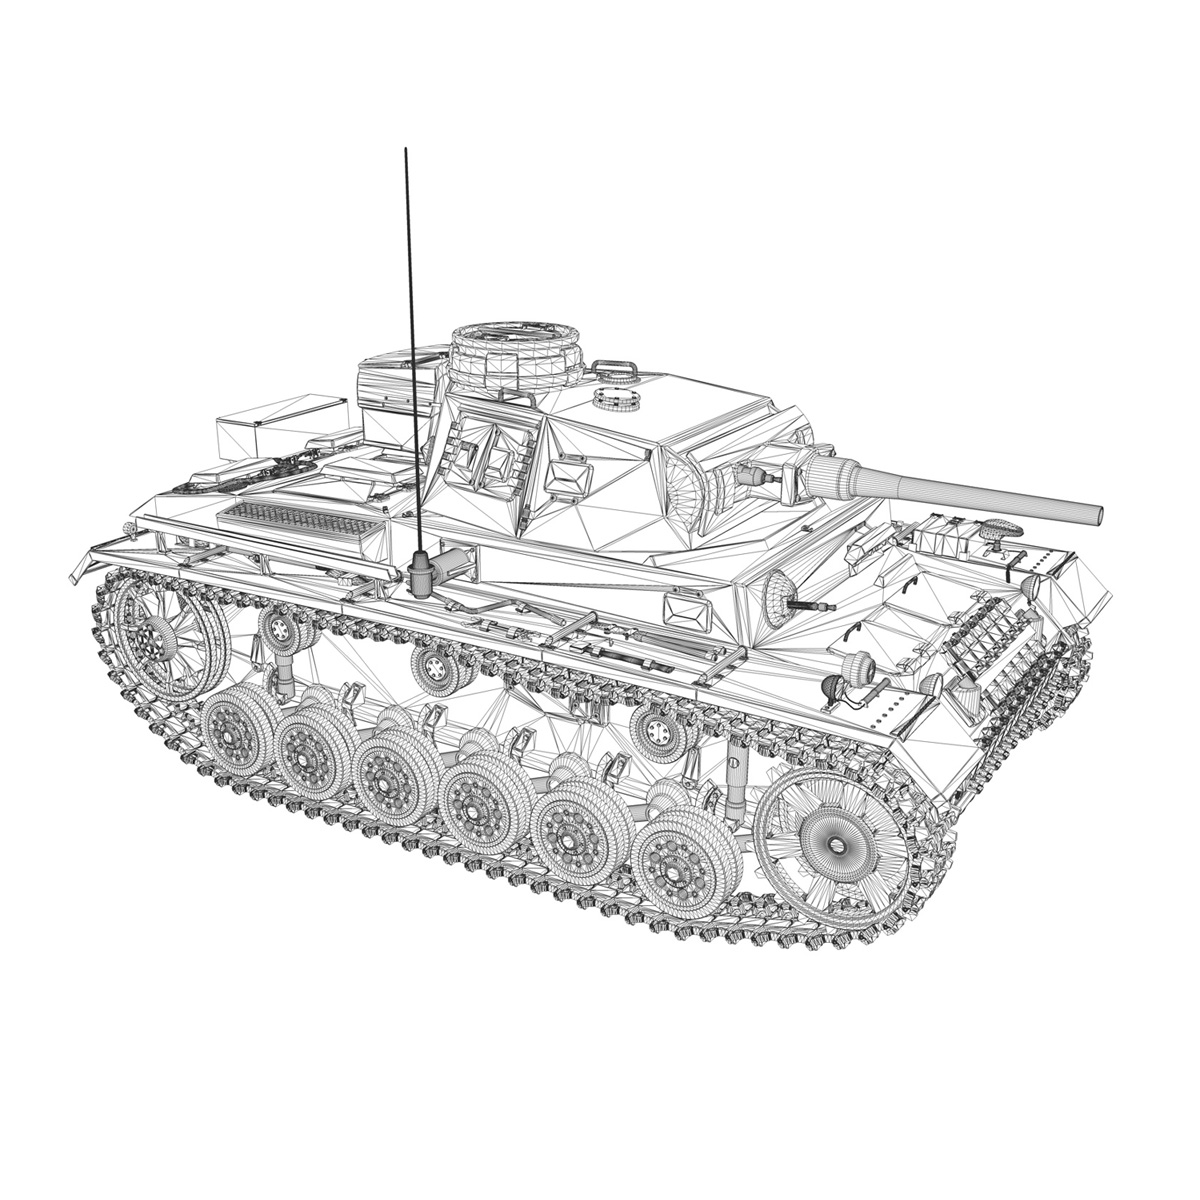 pzkpfw iii – panzer 3 – ausf.j – 1k 3d model lwo lw lws obj c4d 3ds fbx 266455